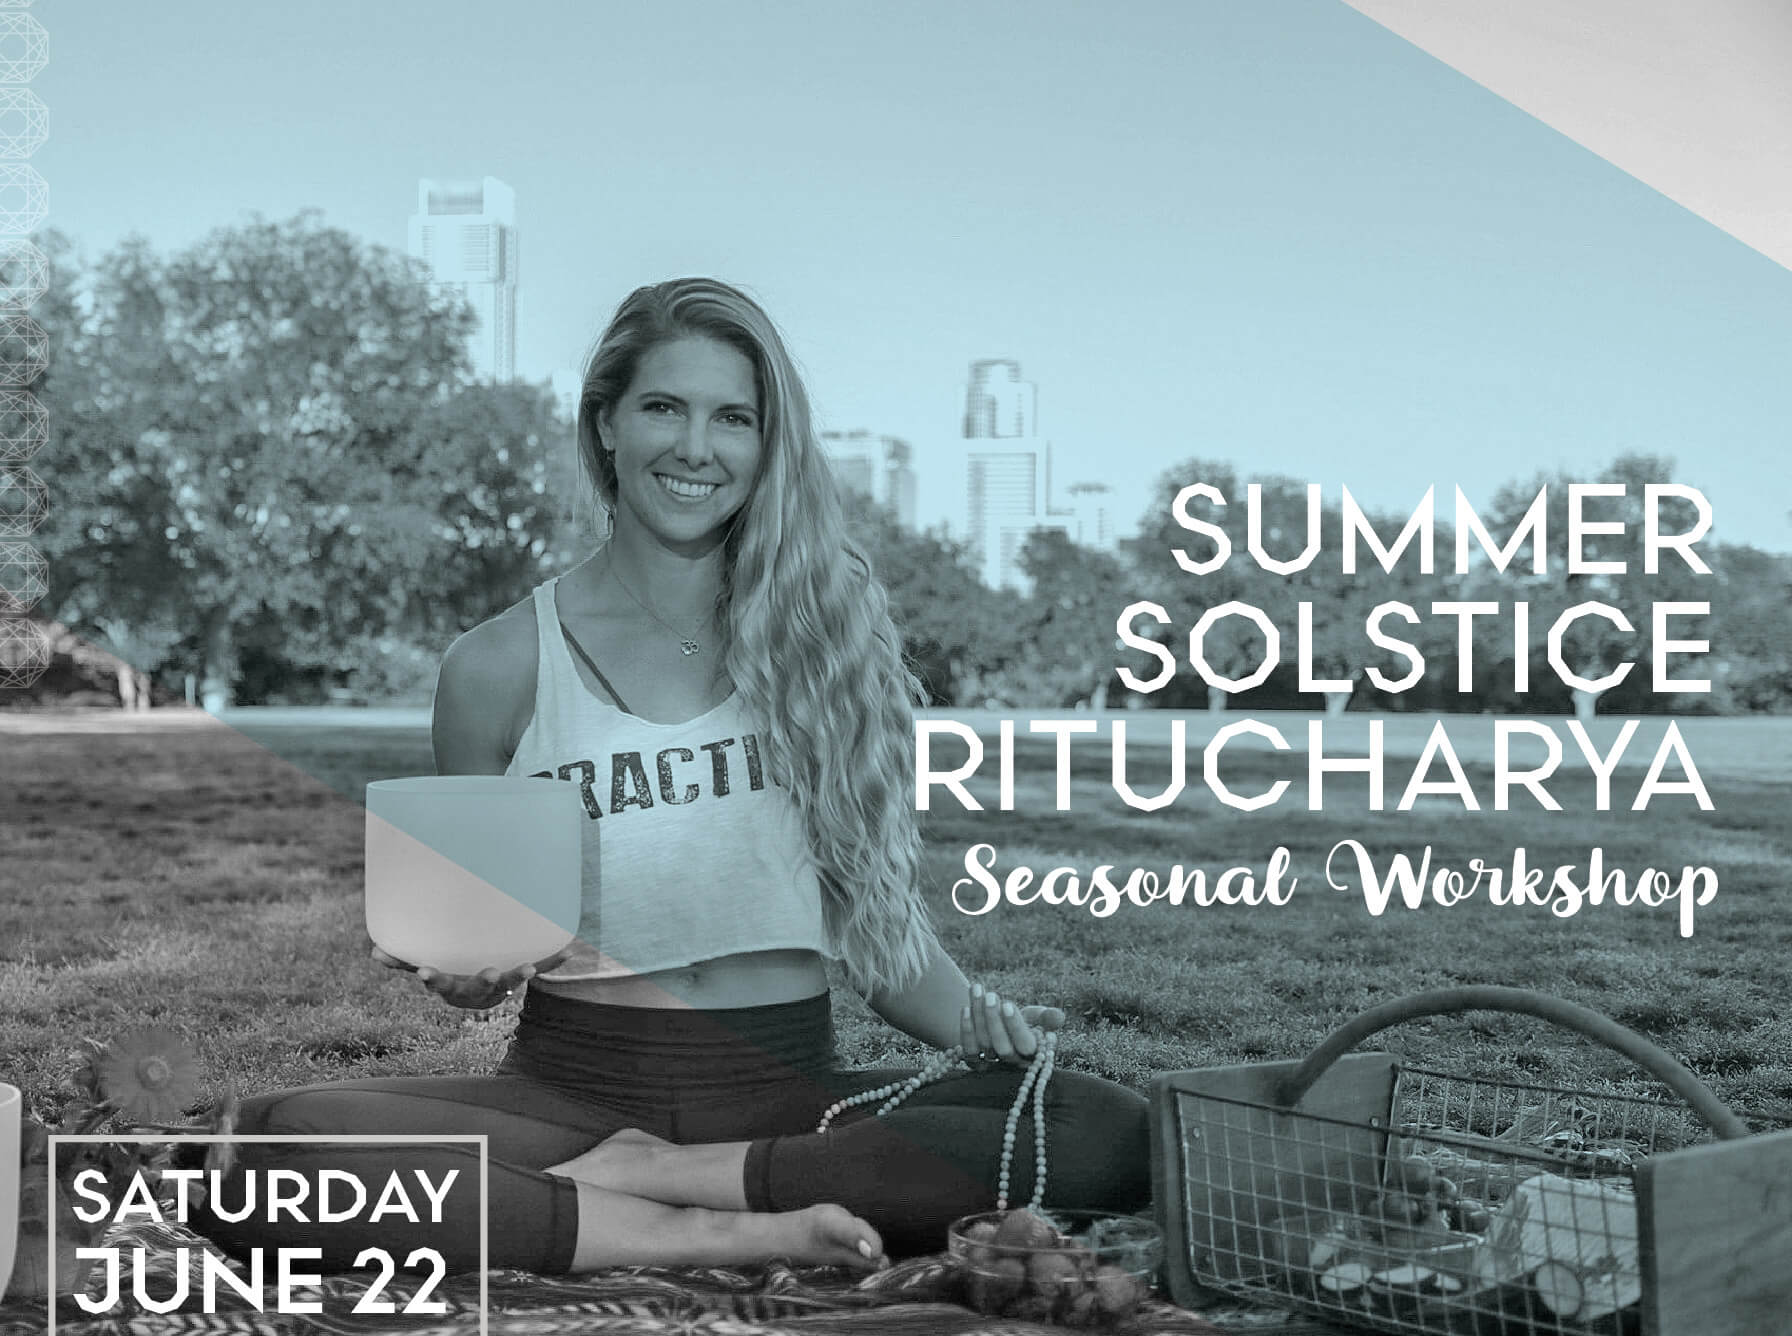 Summer Solstice Ritucharya